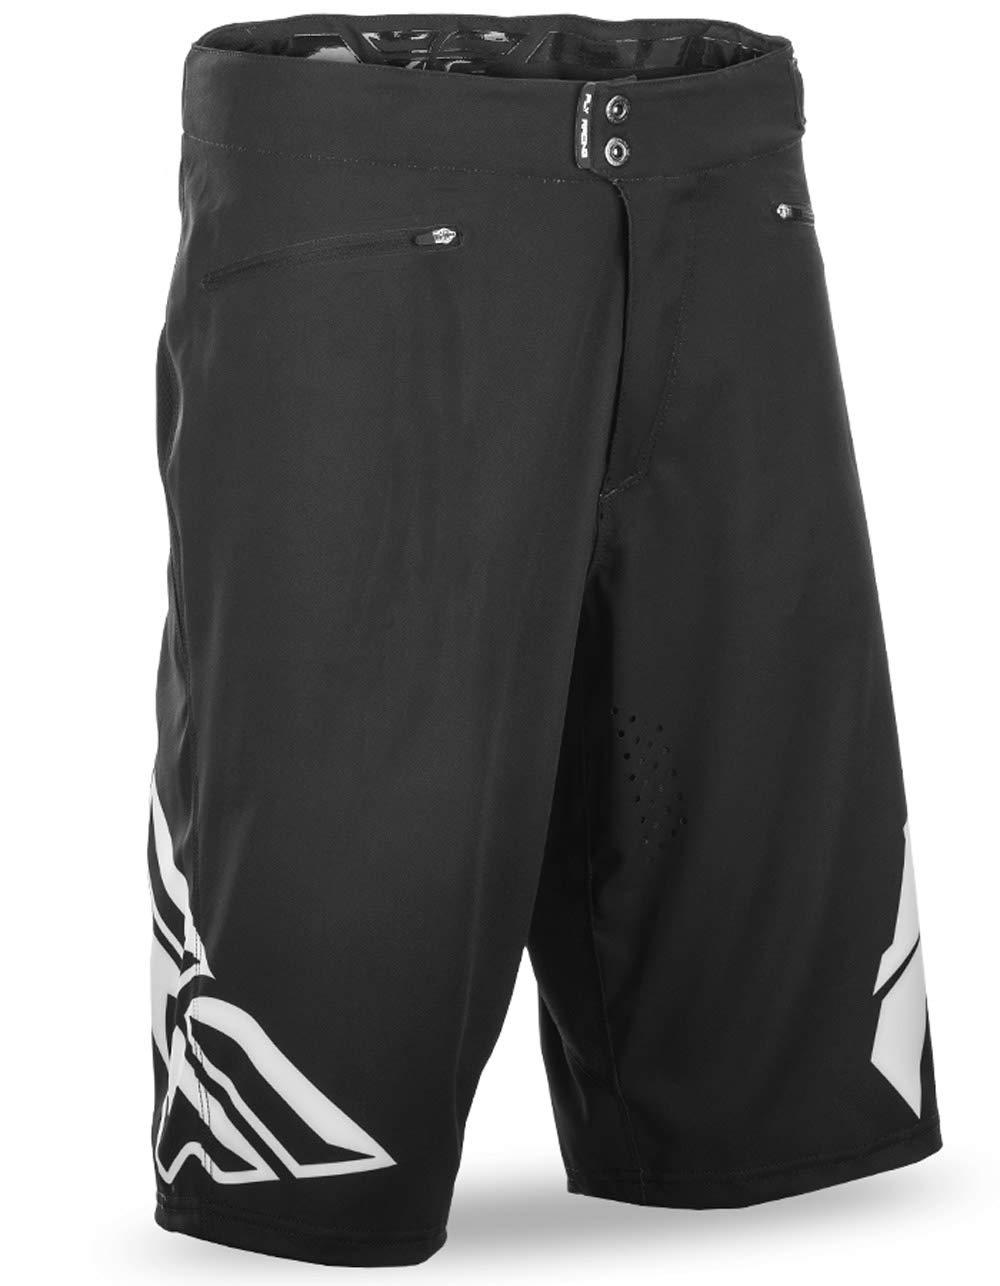 Fly Racing Unisex-Adult Radium Shorts Black/White Size 38 by Fly Racing